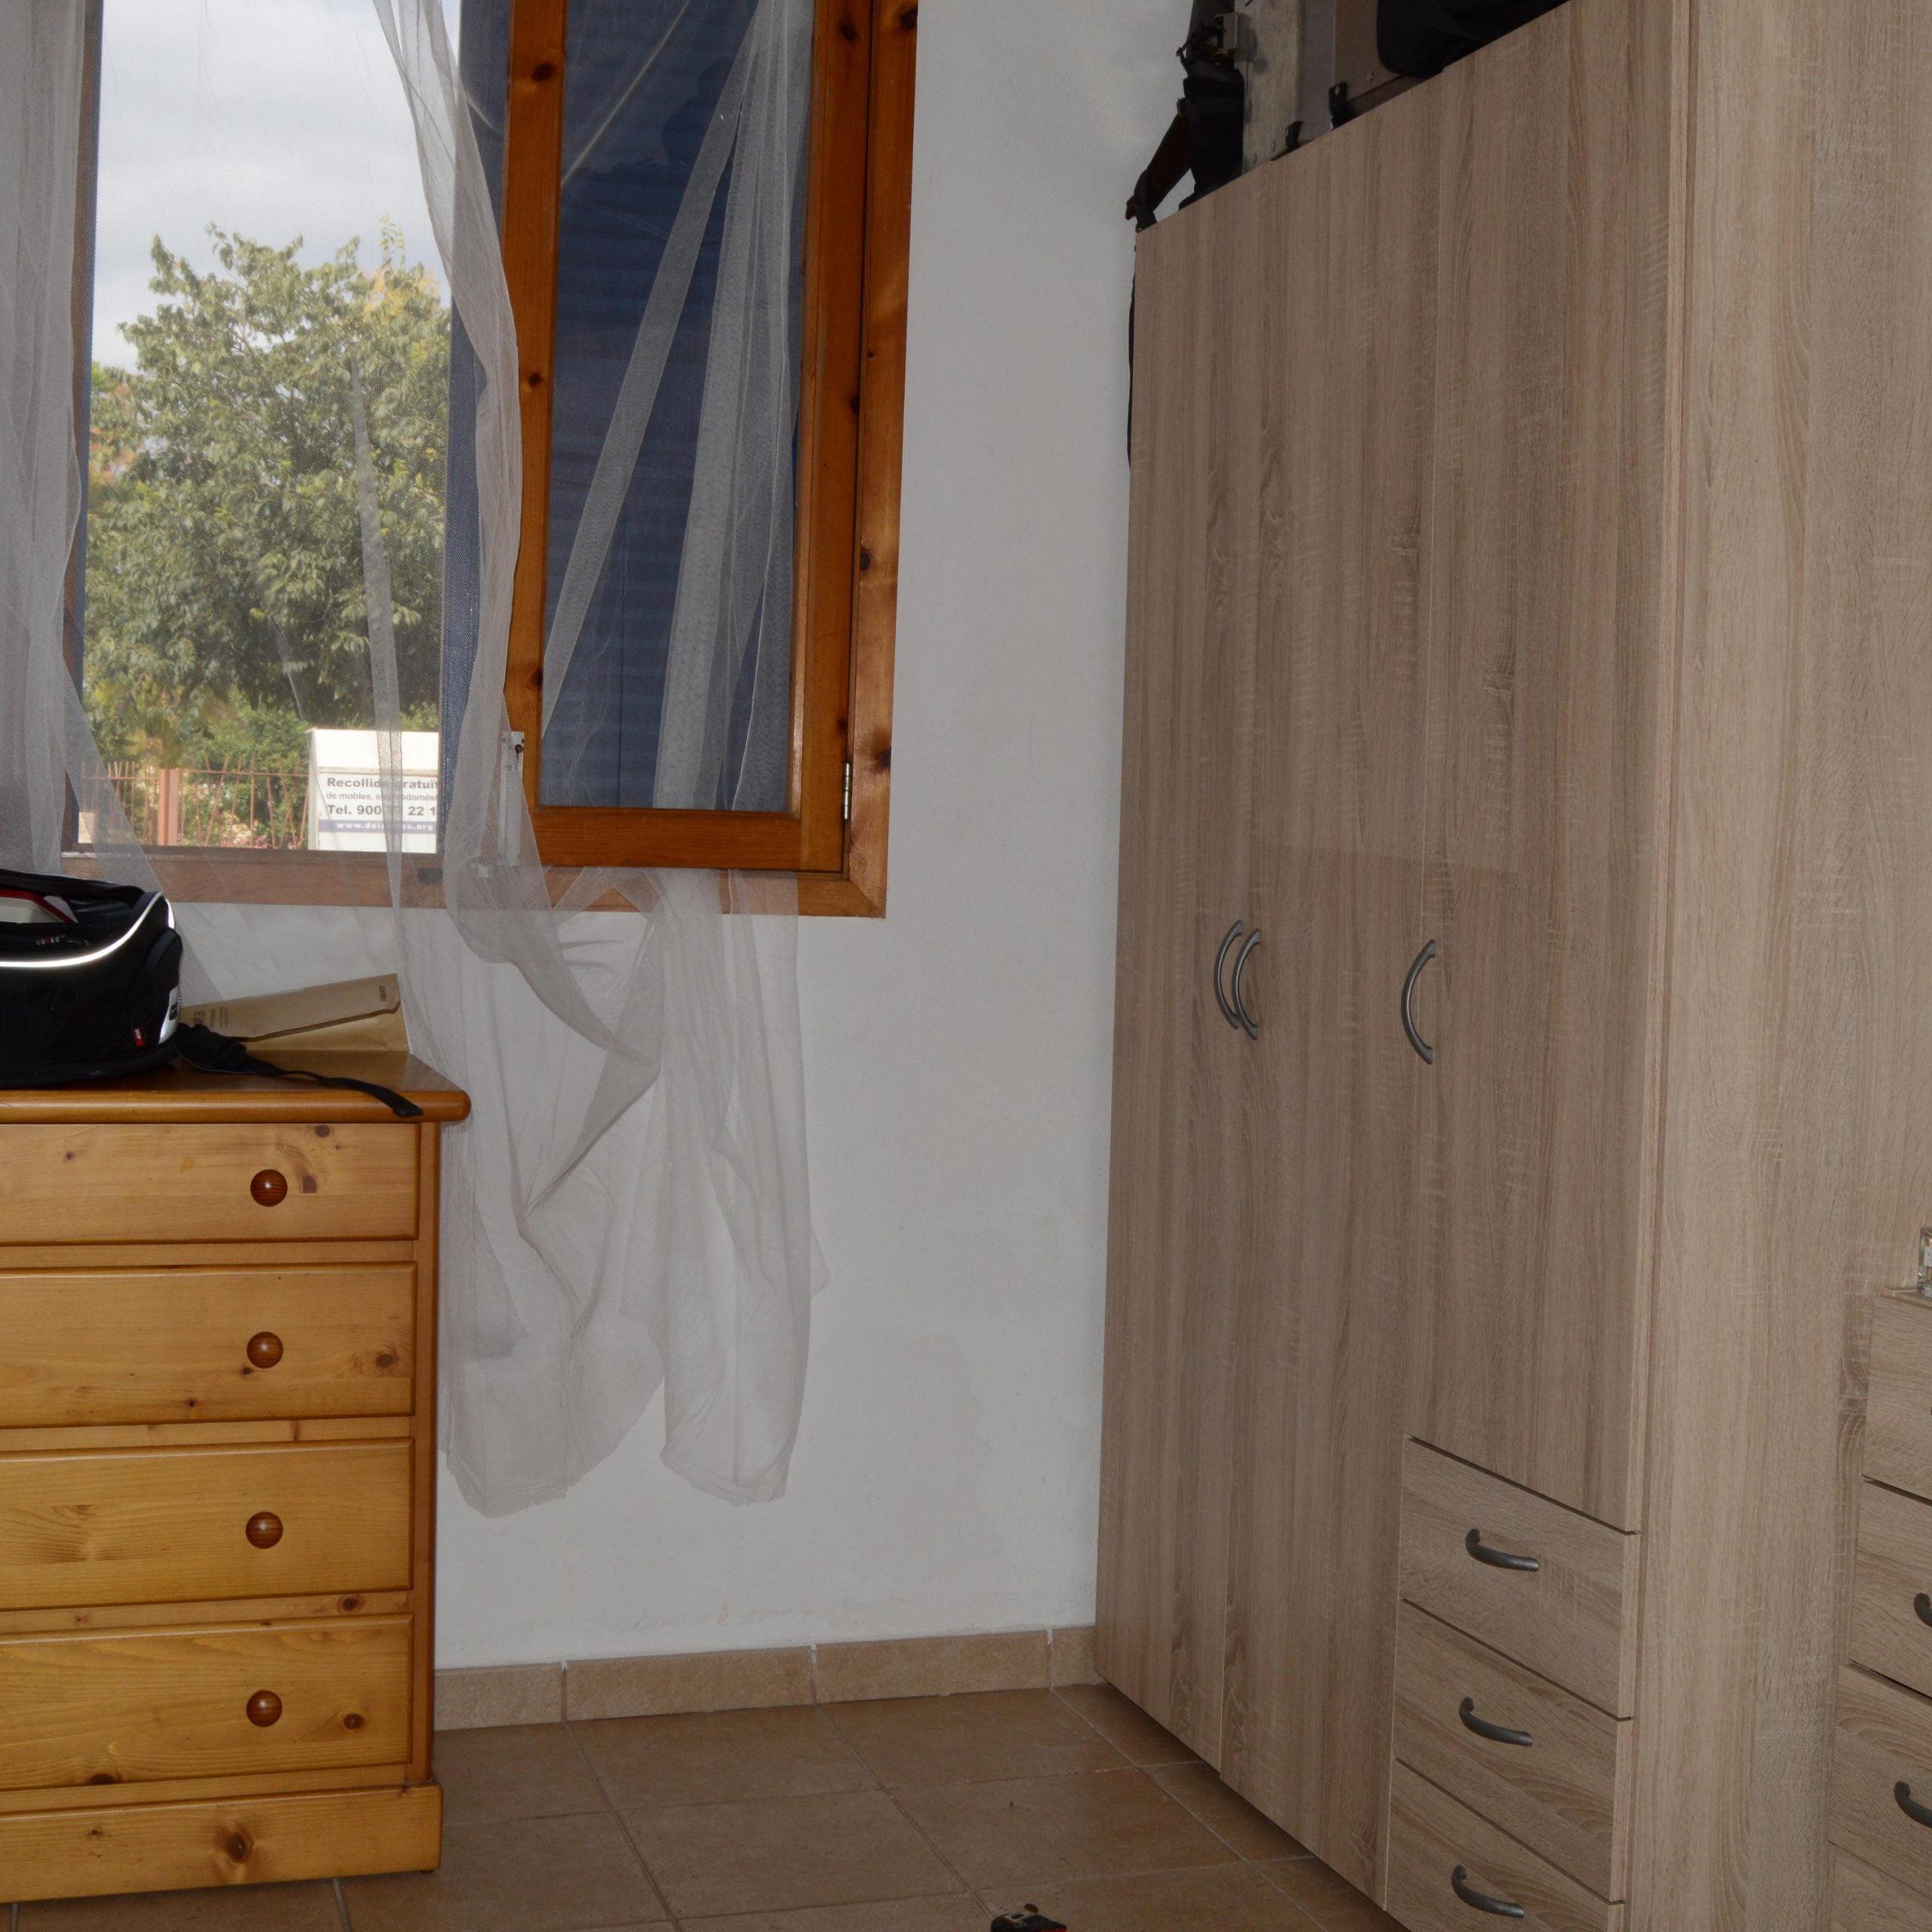 Carrotja - 3 bedroom house in Mallorca